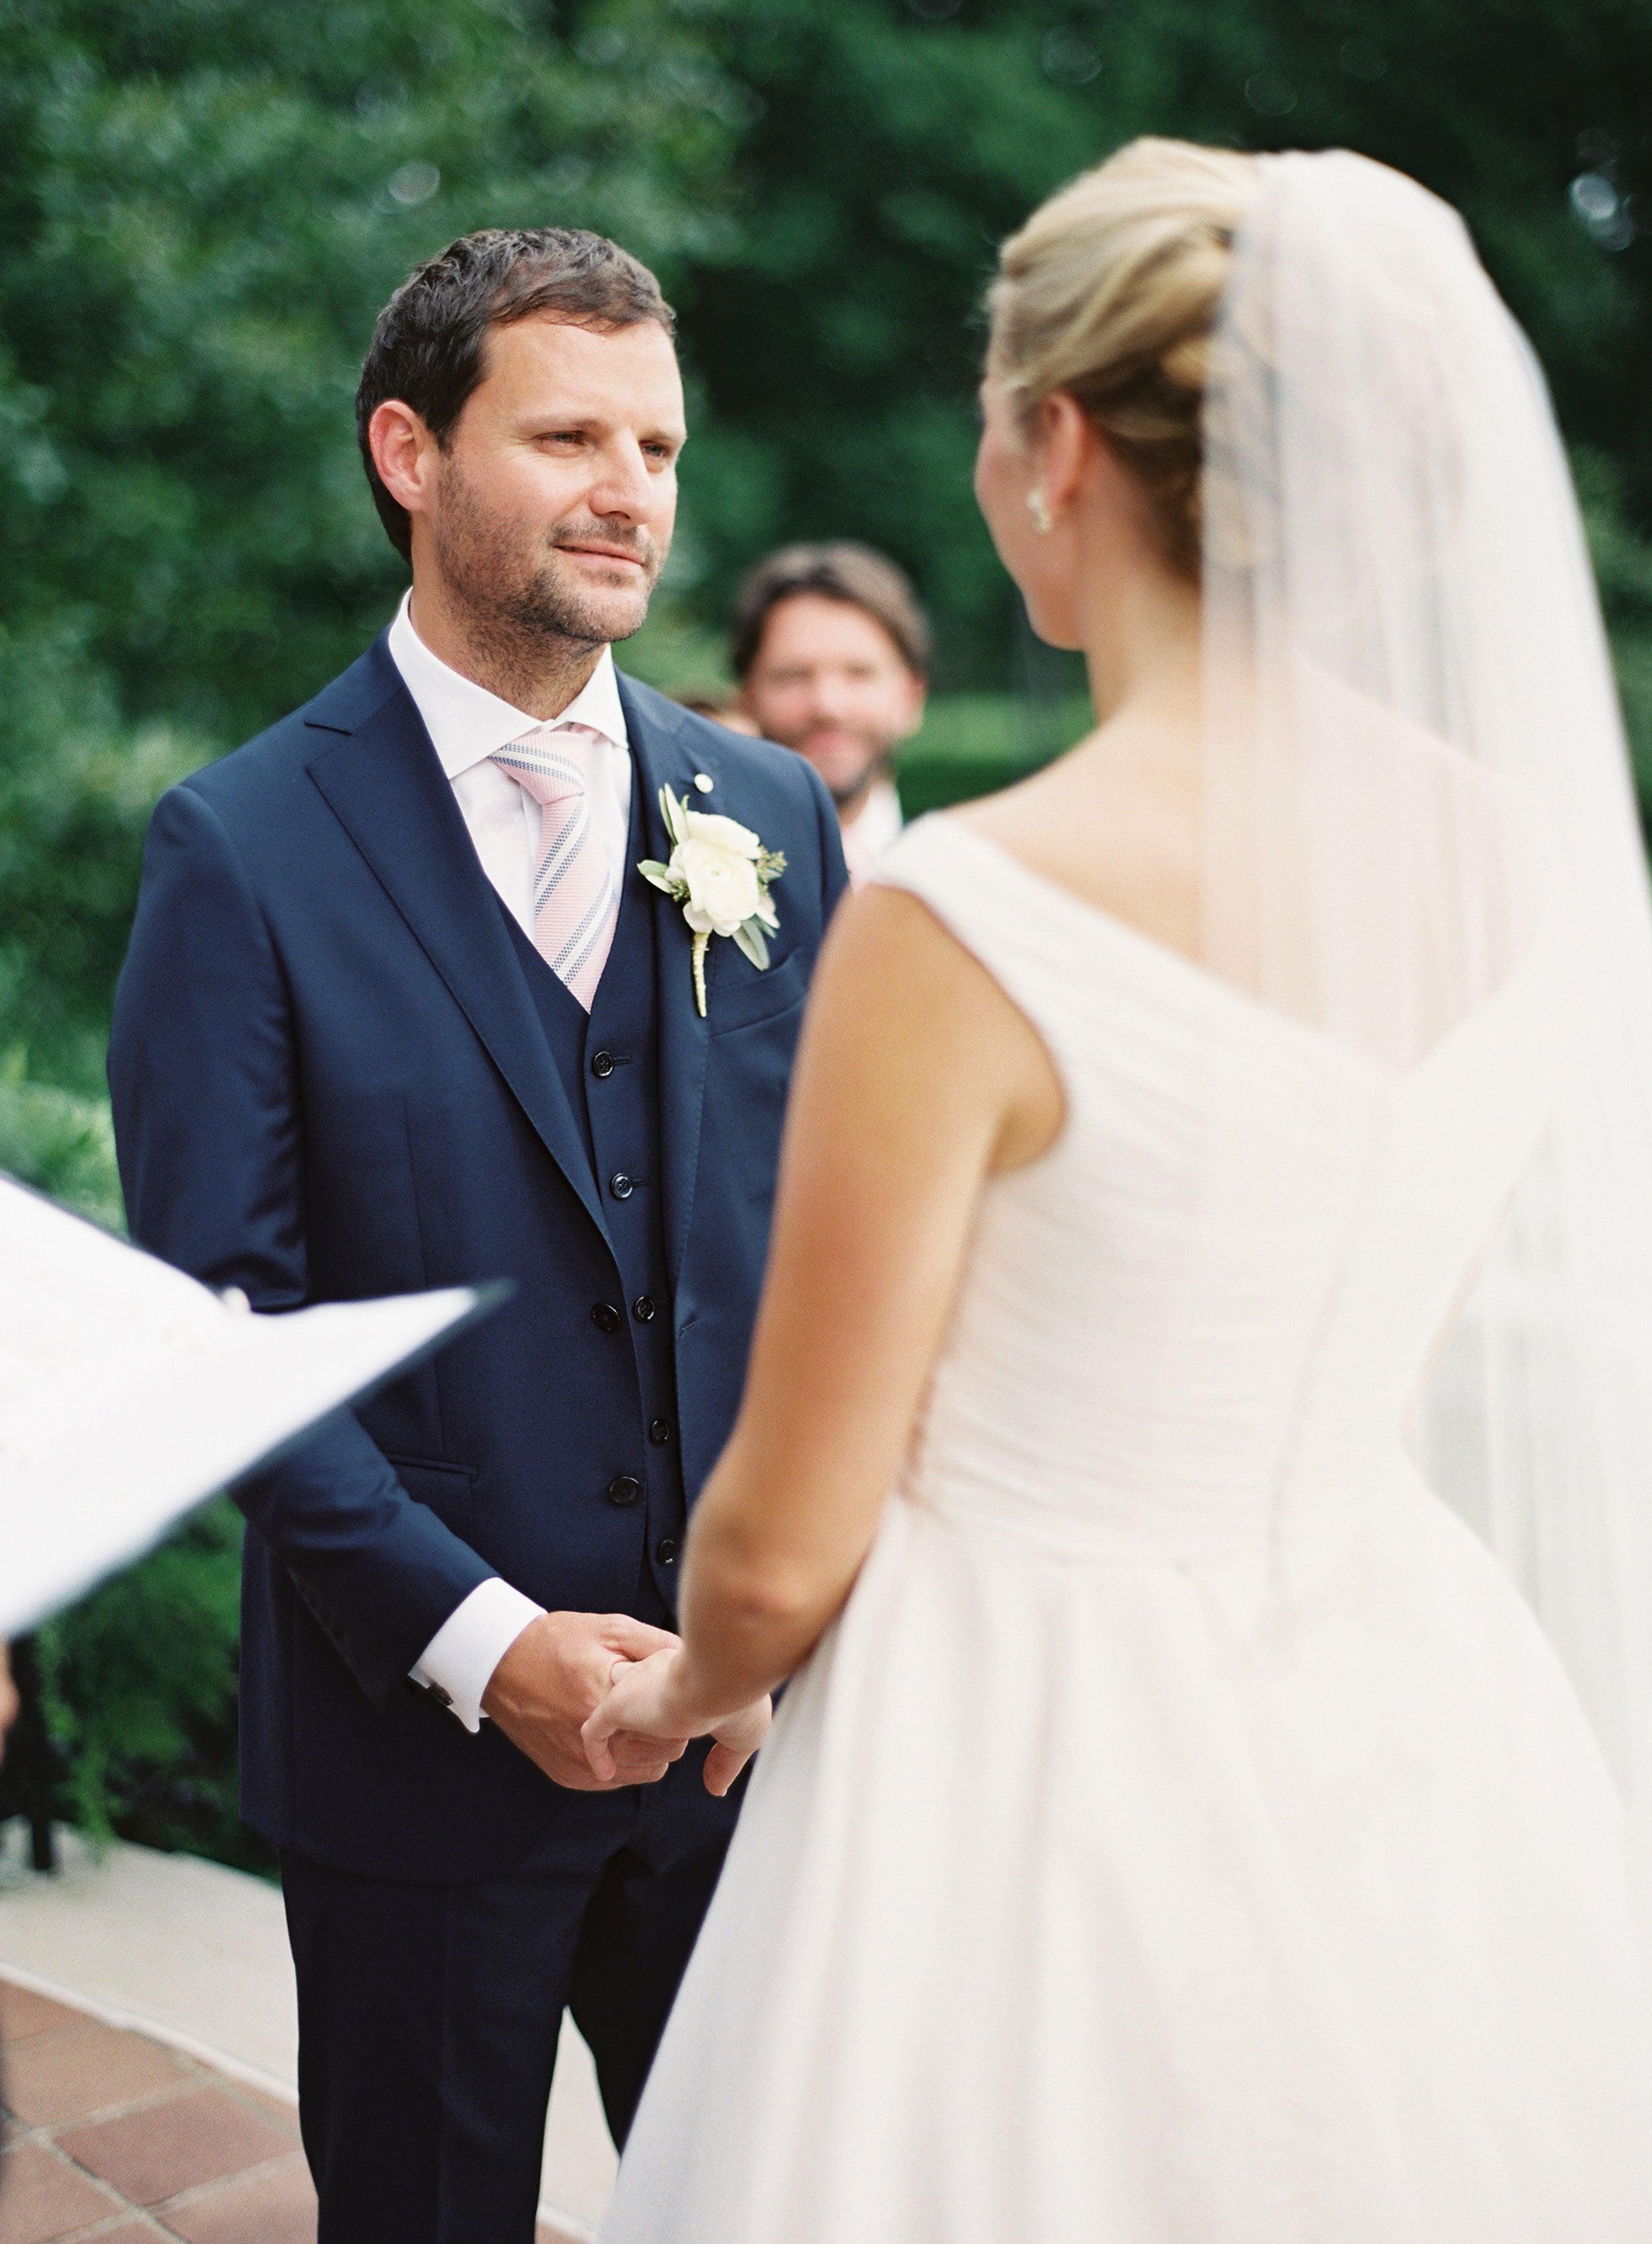 spindletop-lexington-wedding-photographer-024.JPG